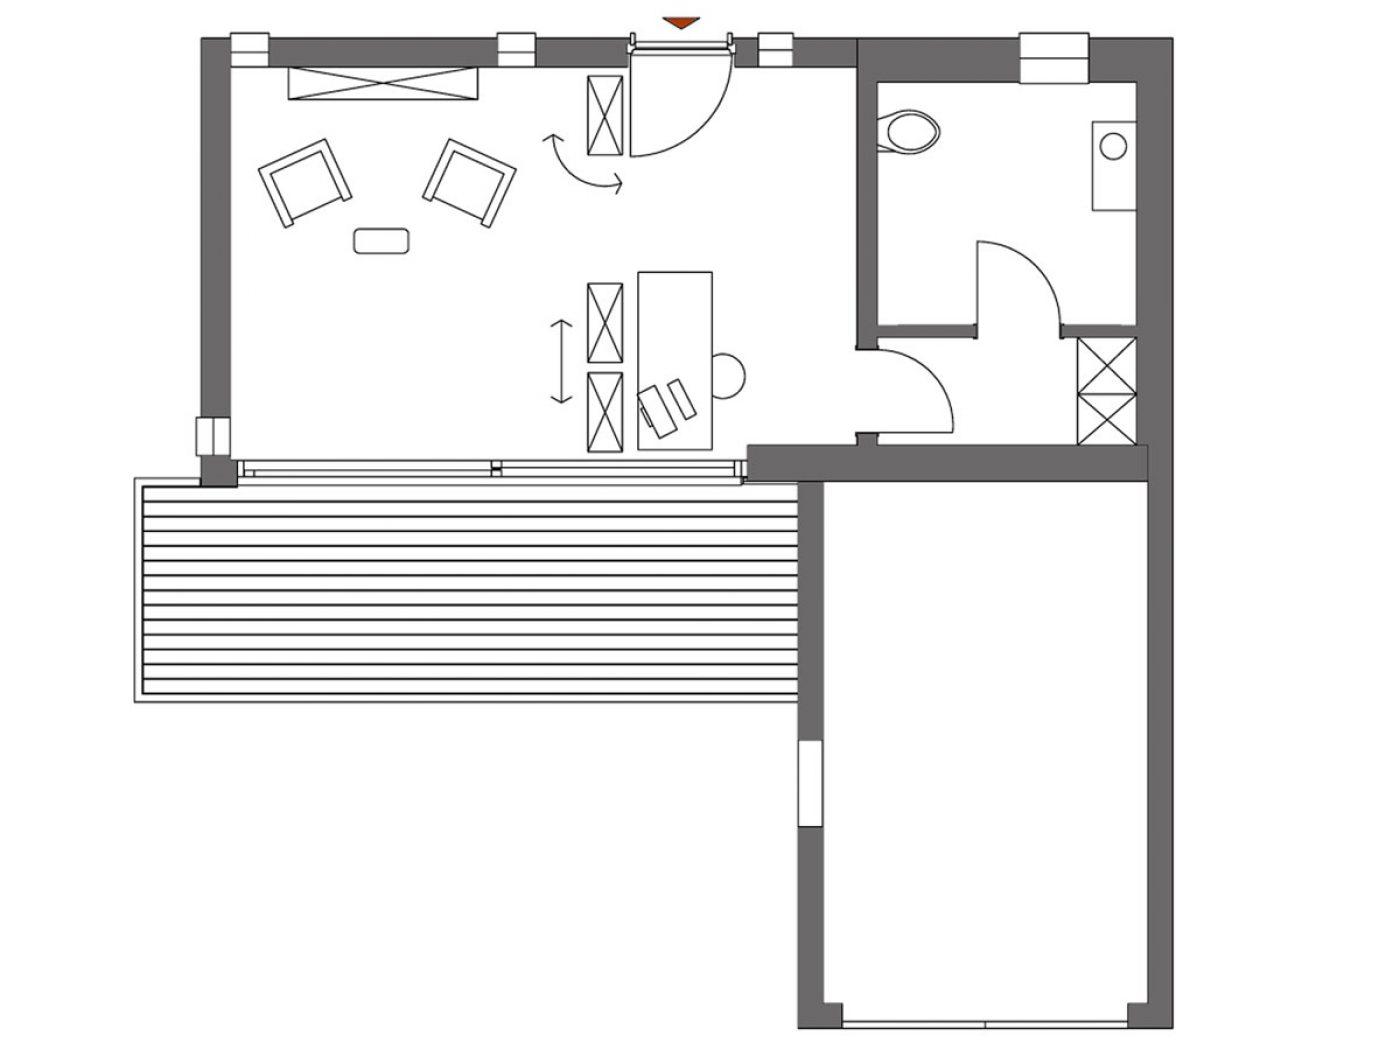 atelierhaus grundriss